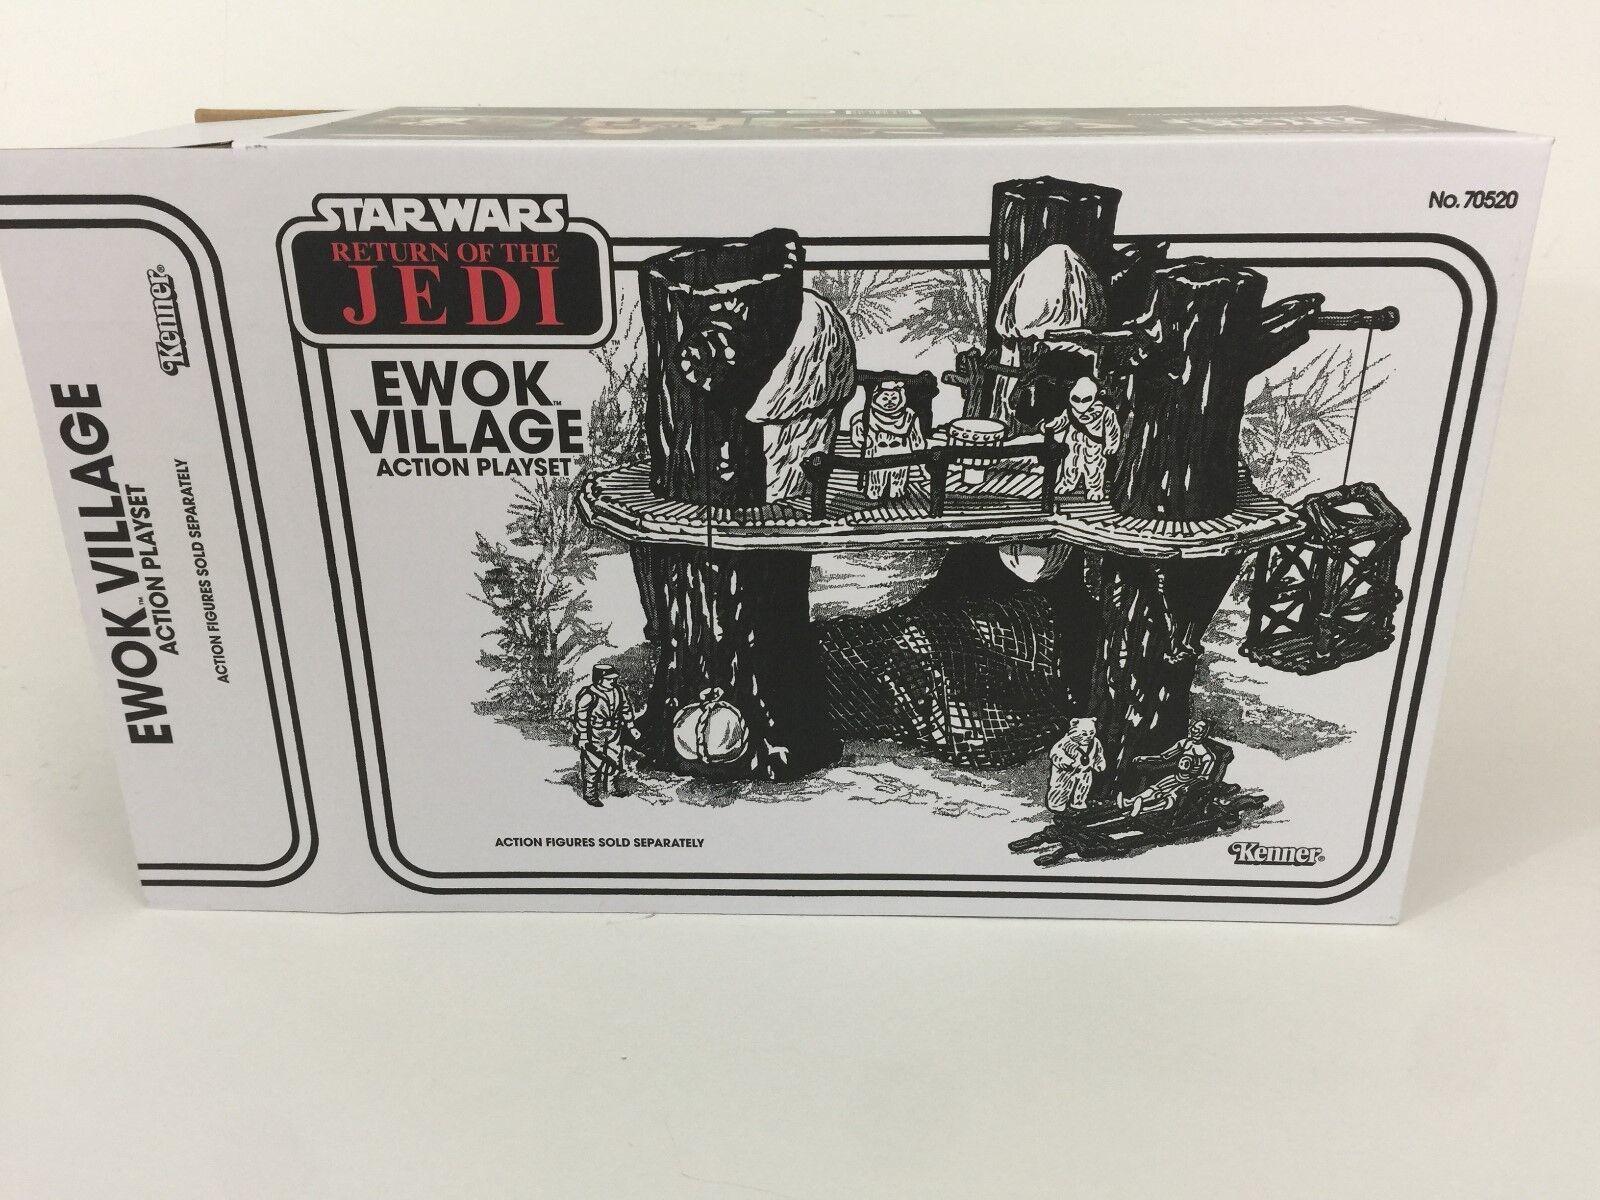 Replacement vintage star wars redj ewok village box box box and inserts a4d4d4